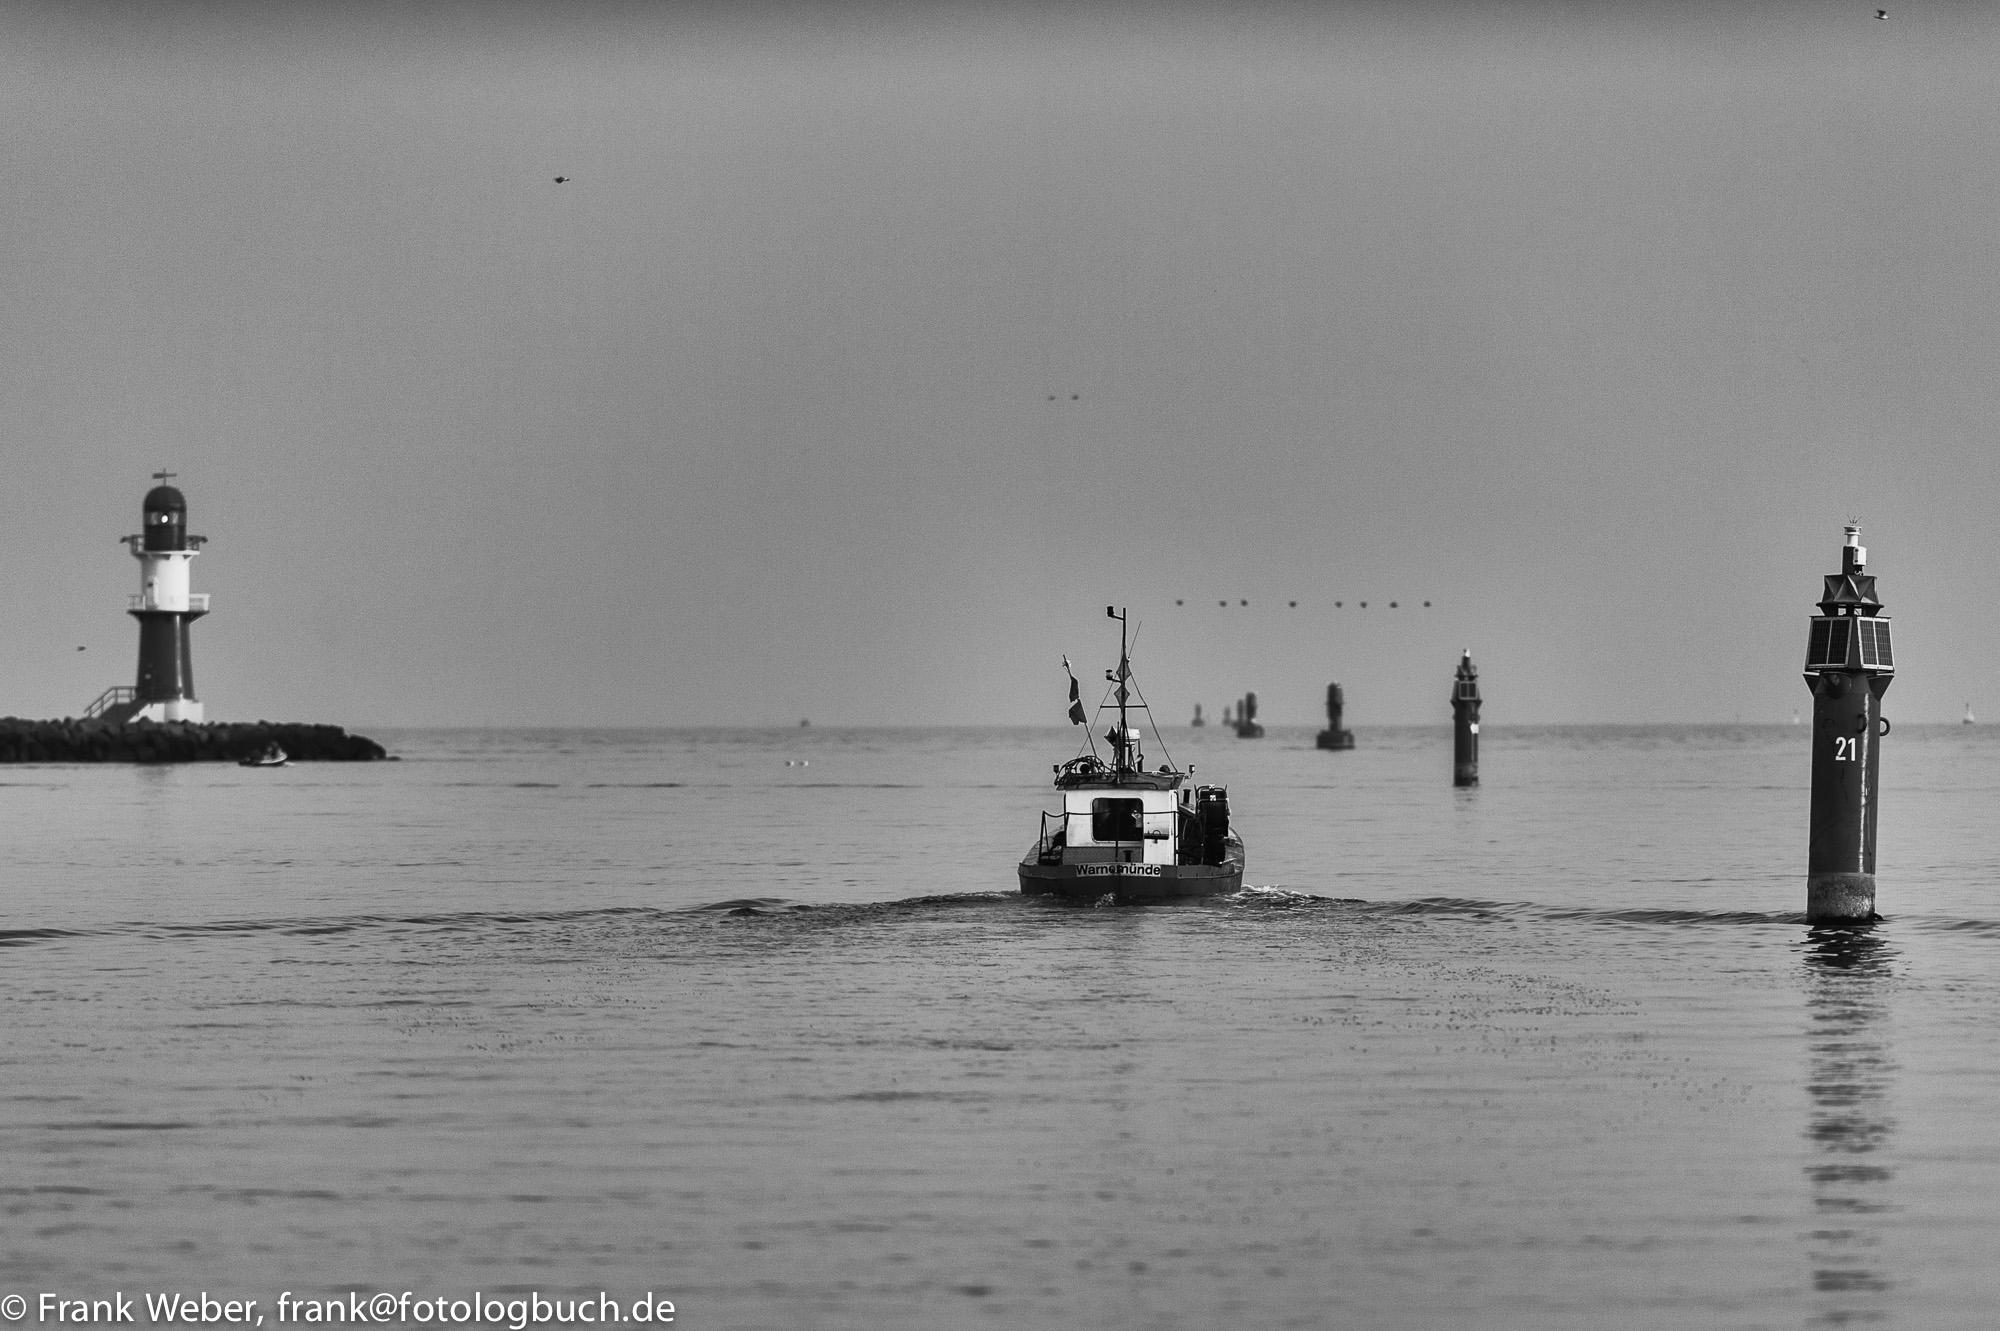 Ausfahrt Fischerboot Hafen Warnemünde mit Leuchtturm, (Foto copyright - Frank Weber - Berlin - fotologbuch.de)